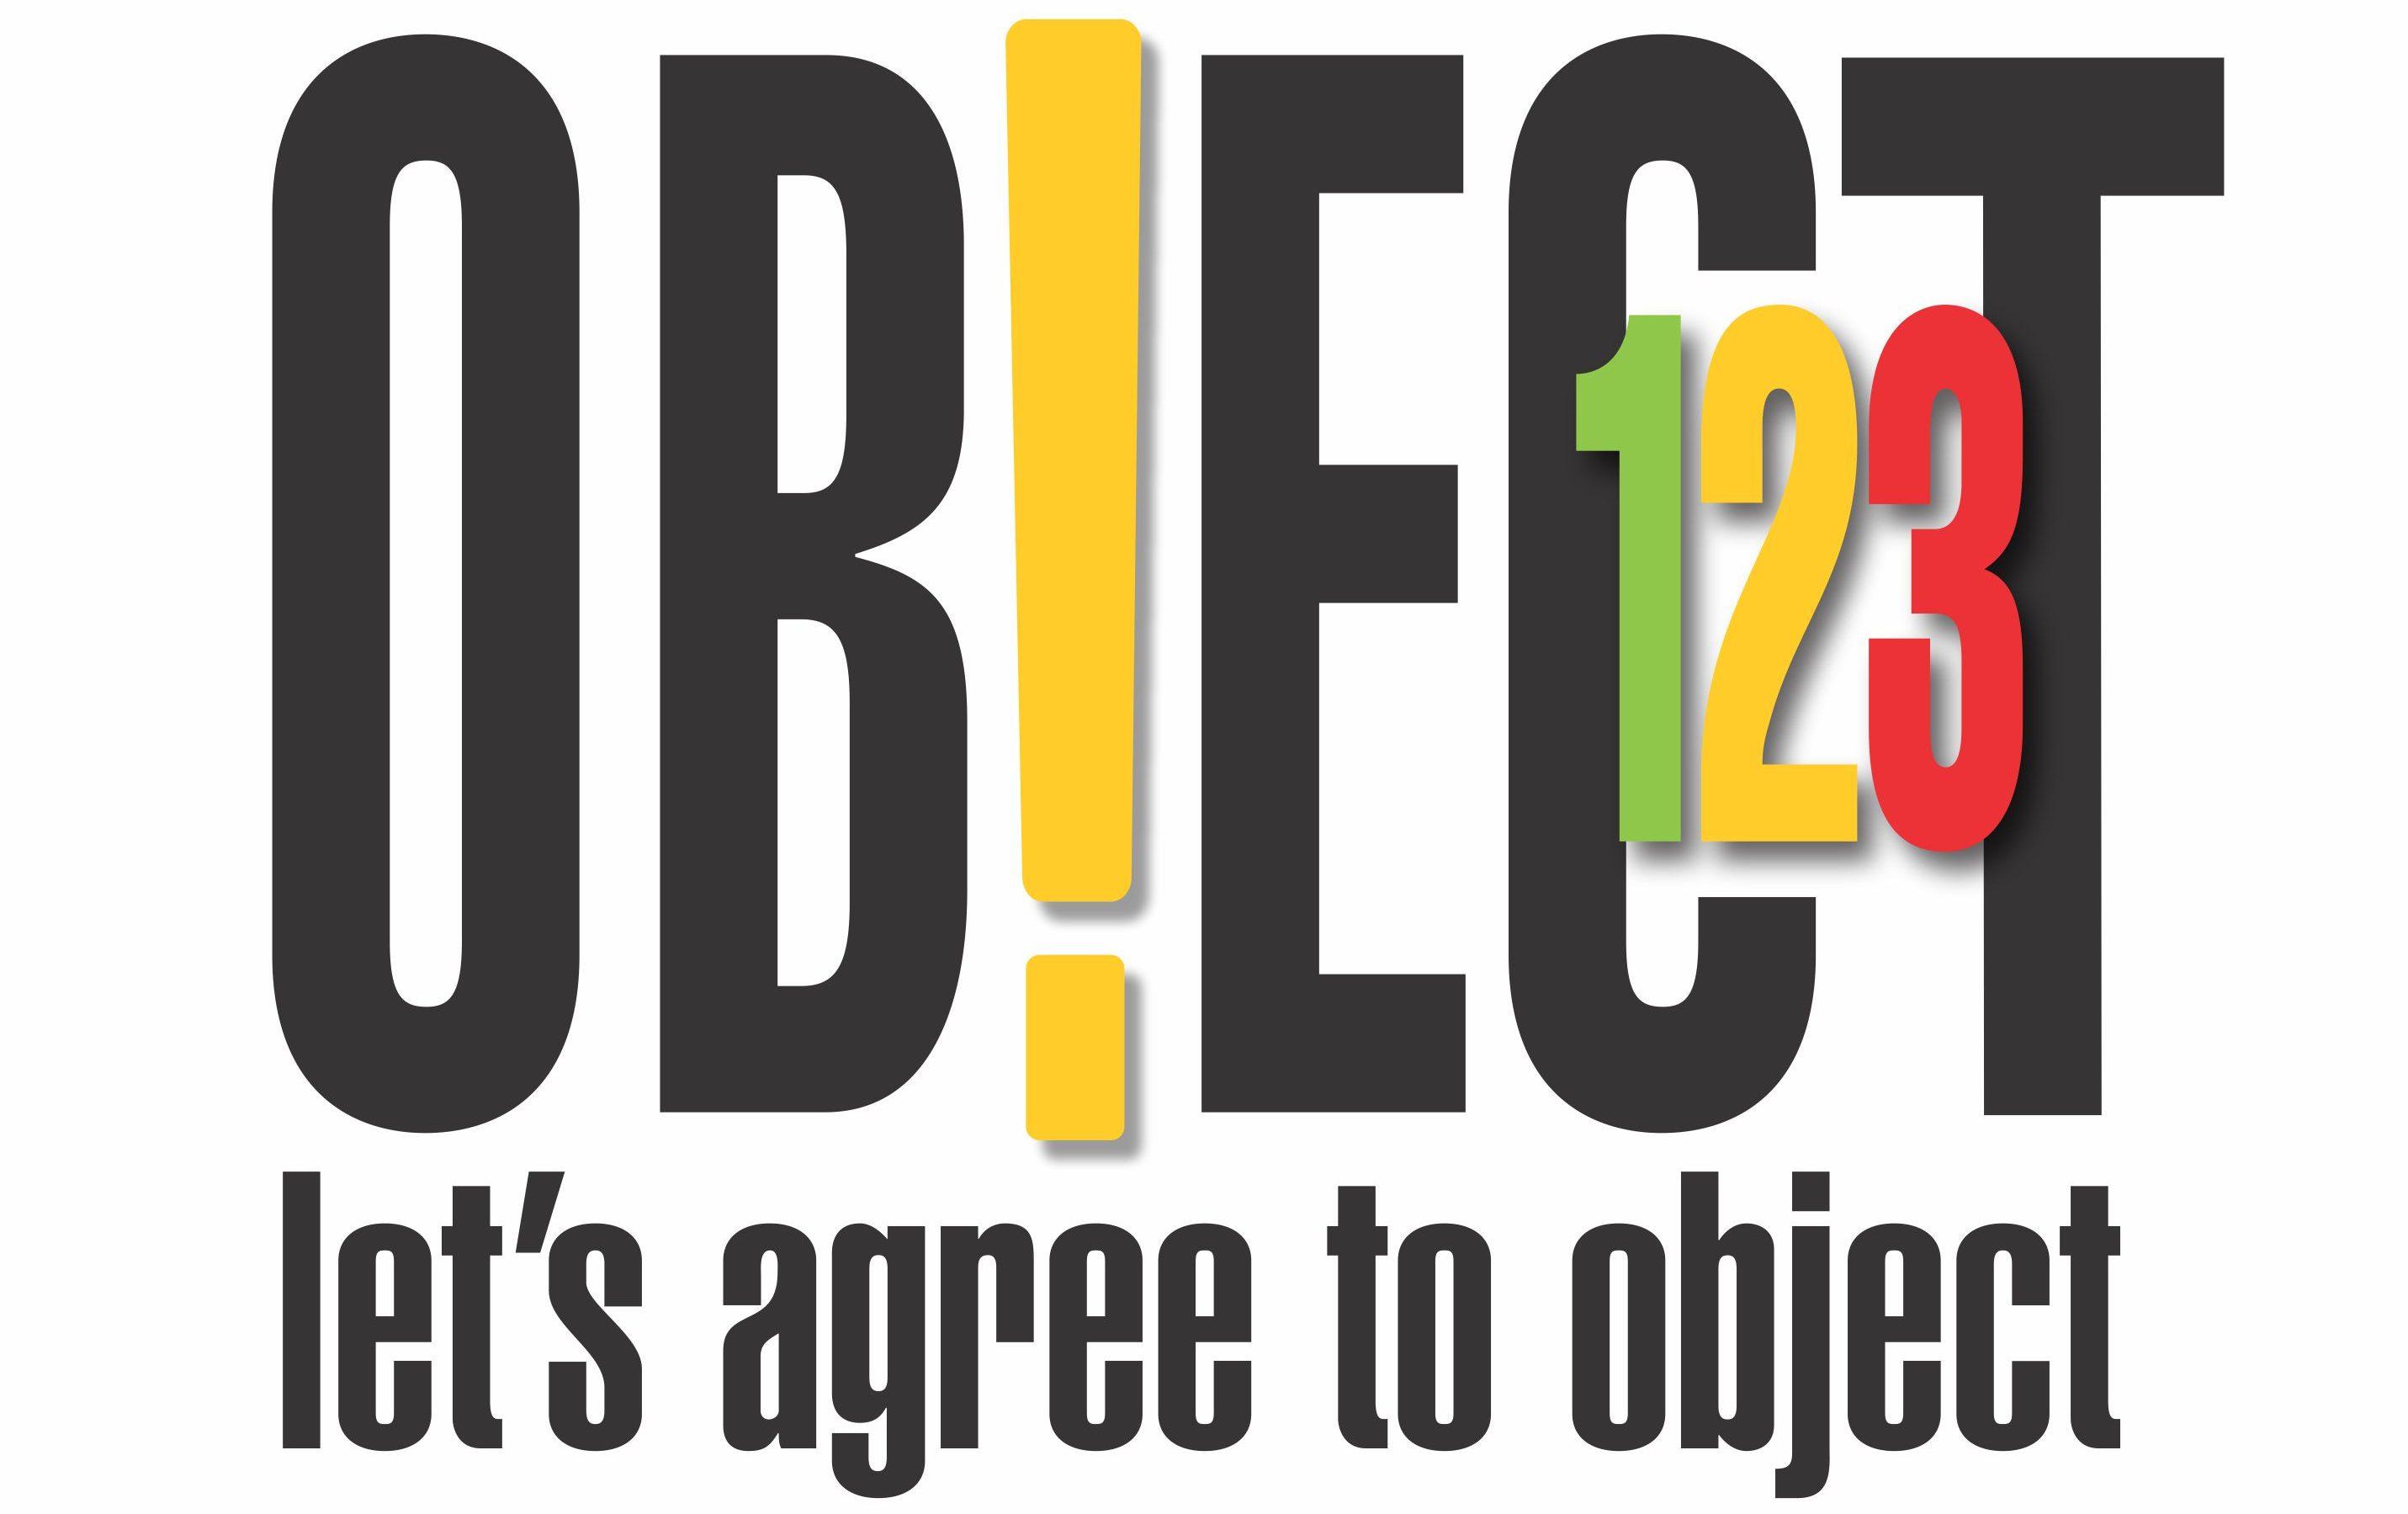 Object123